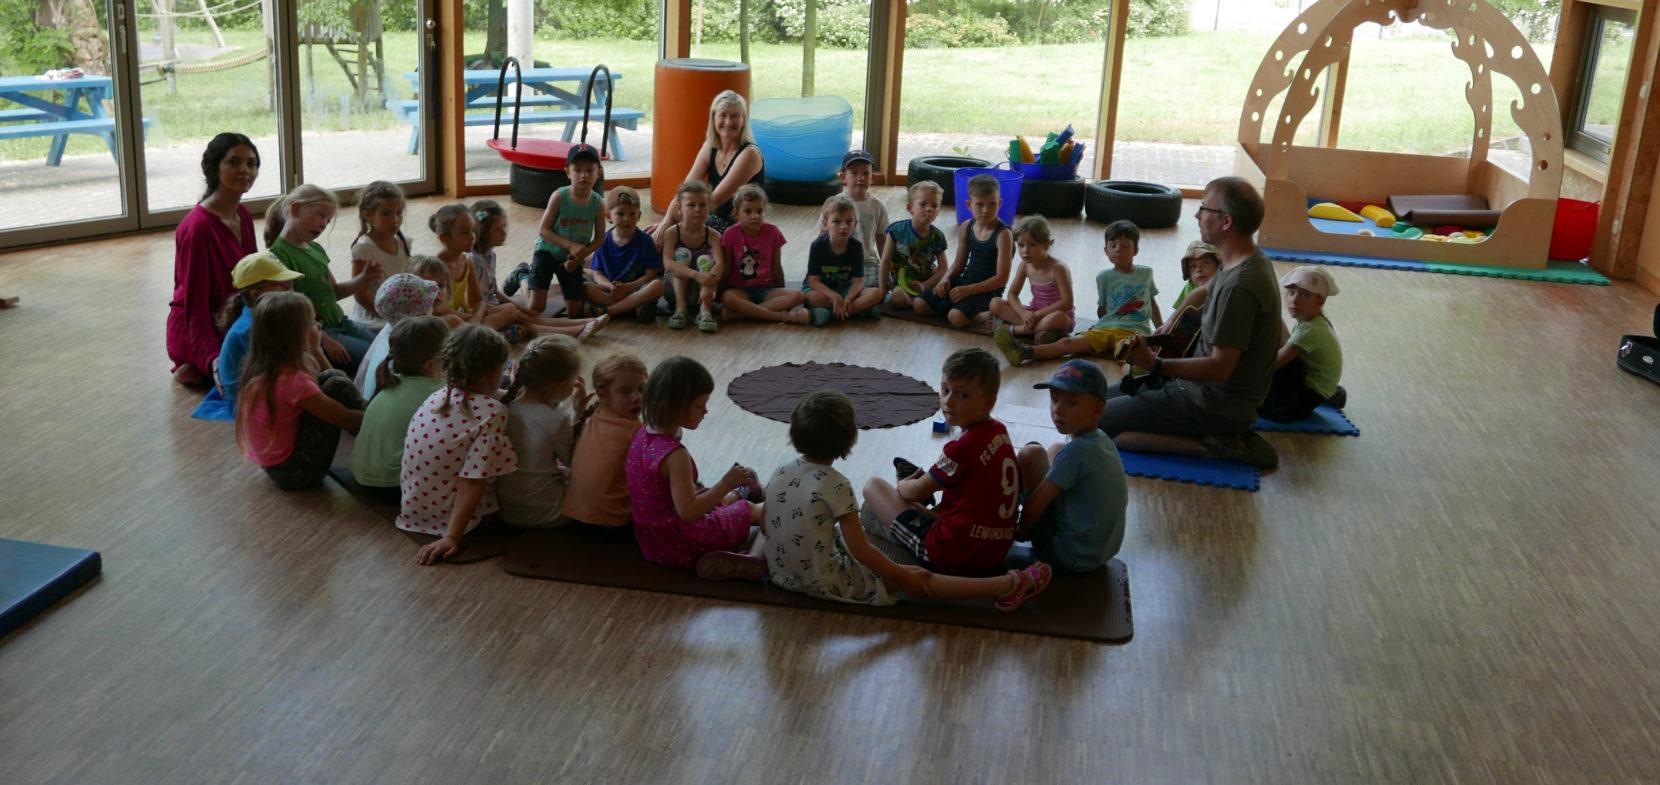 Morgenkreis im Kindergarten